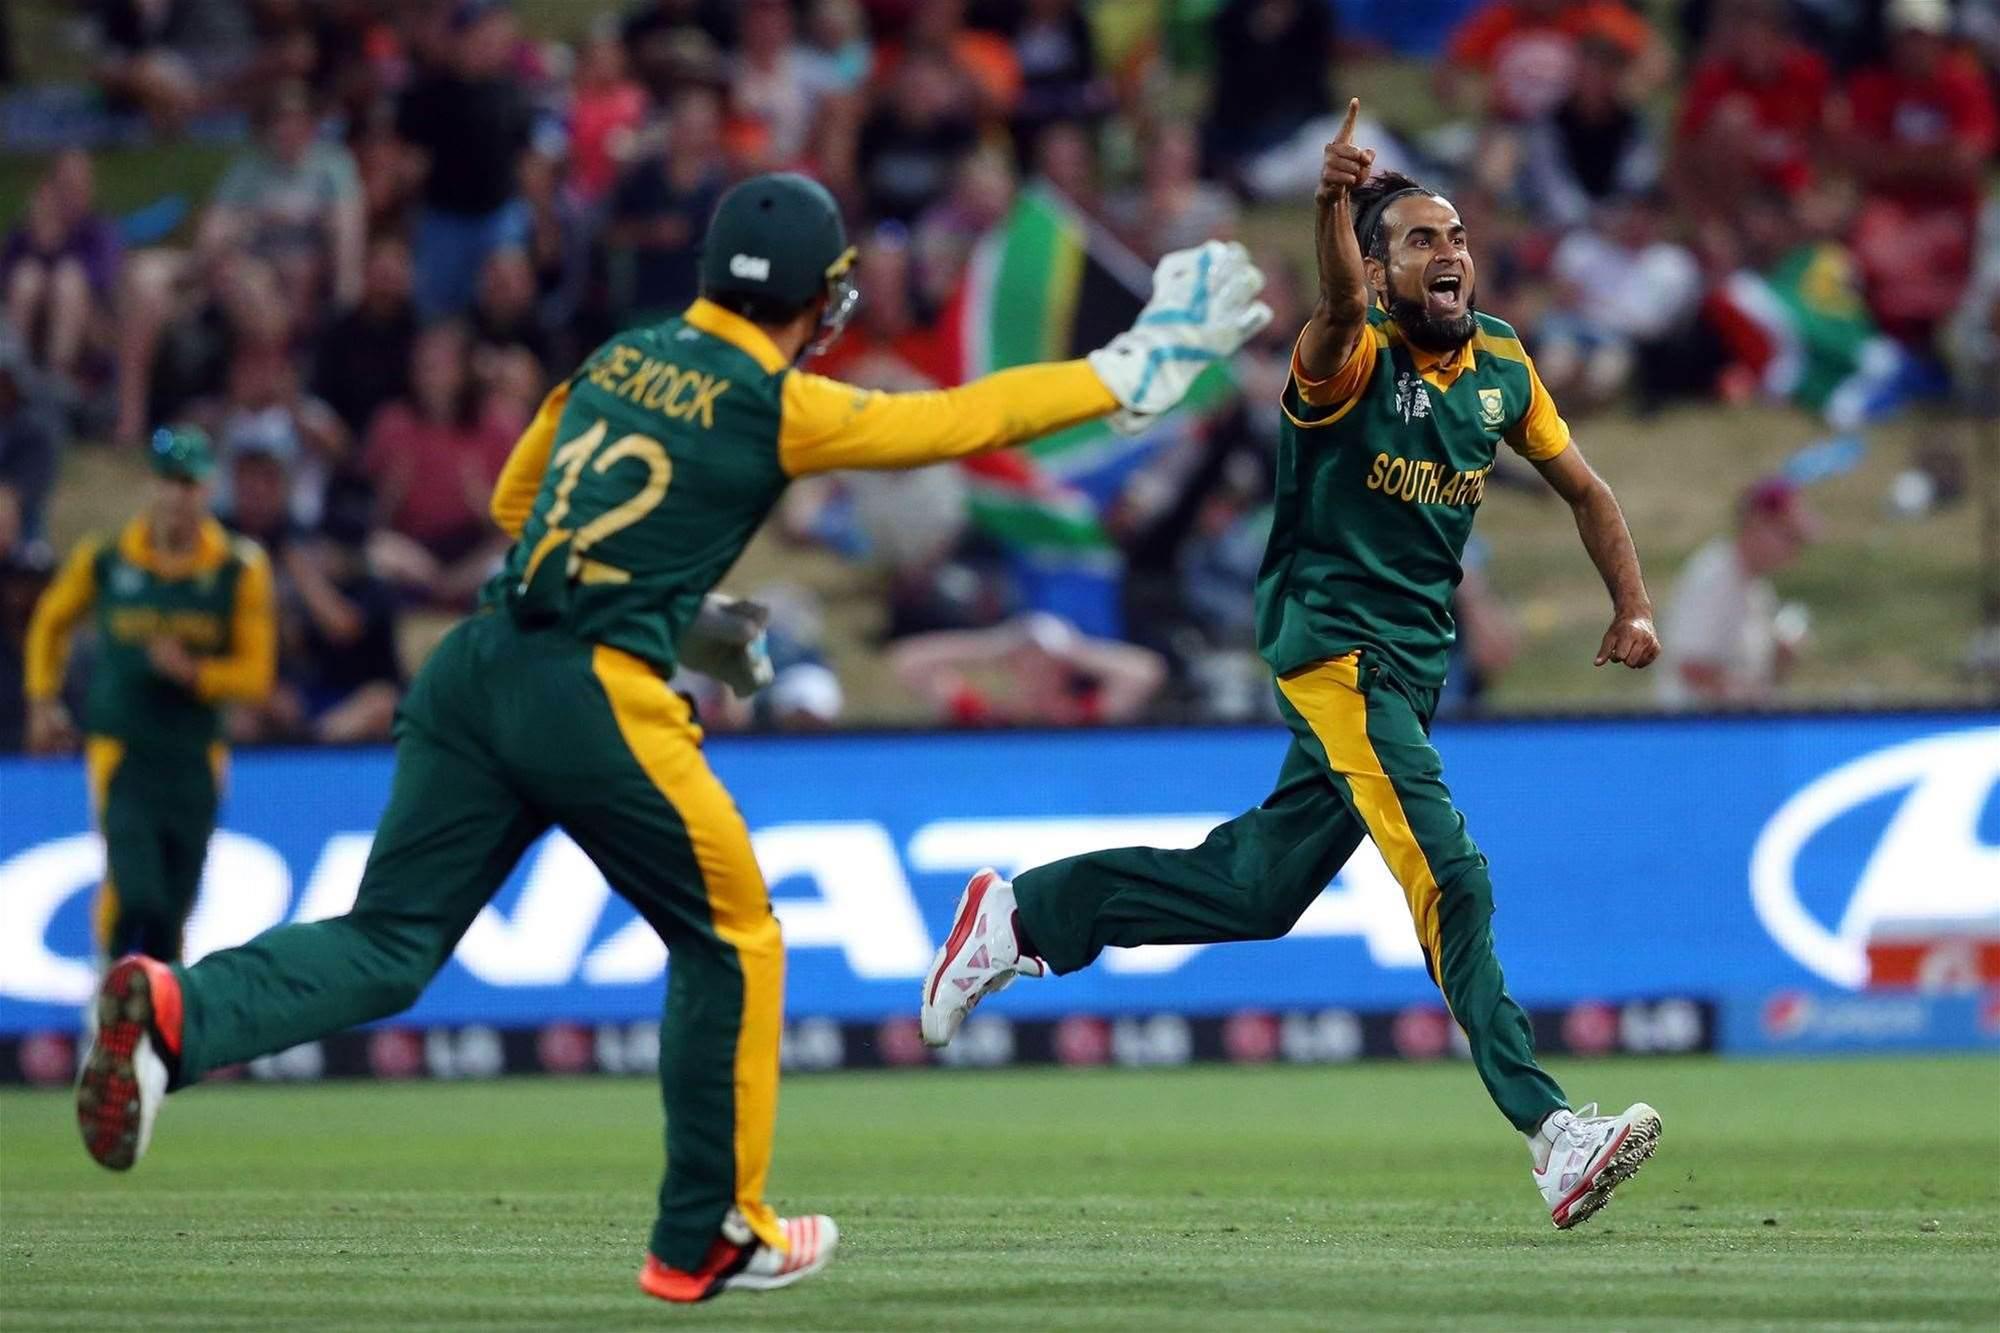 SA V ZIM: Imran Tahir … excitement machine